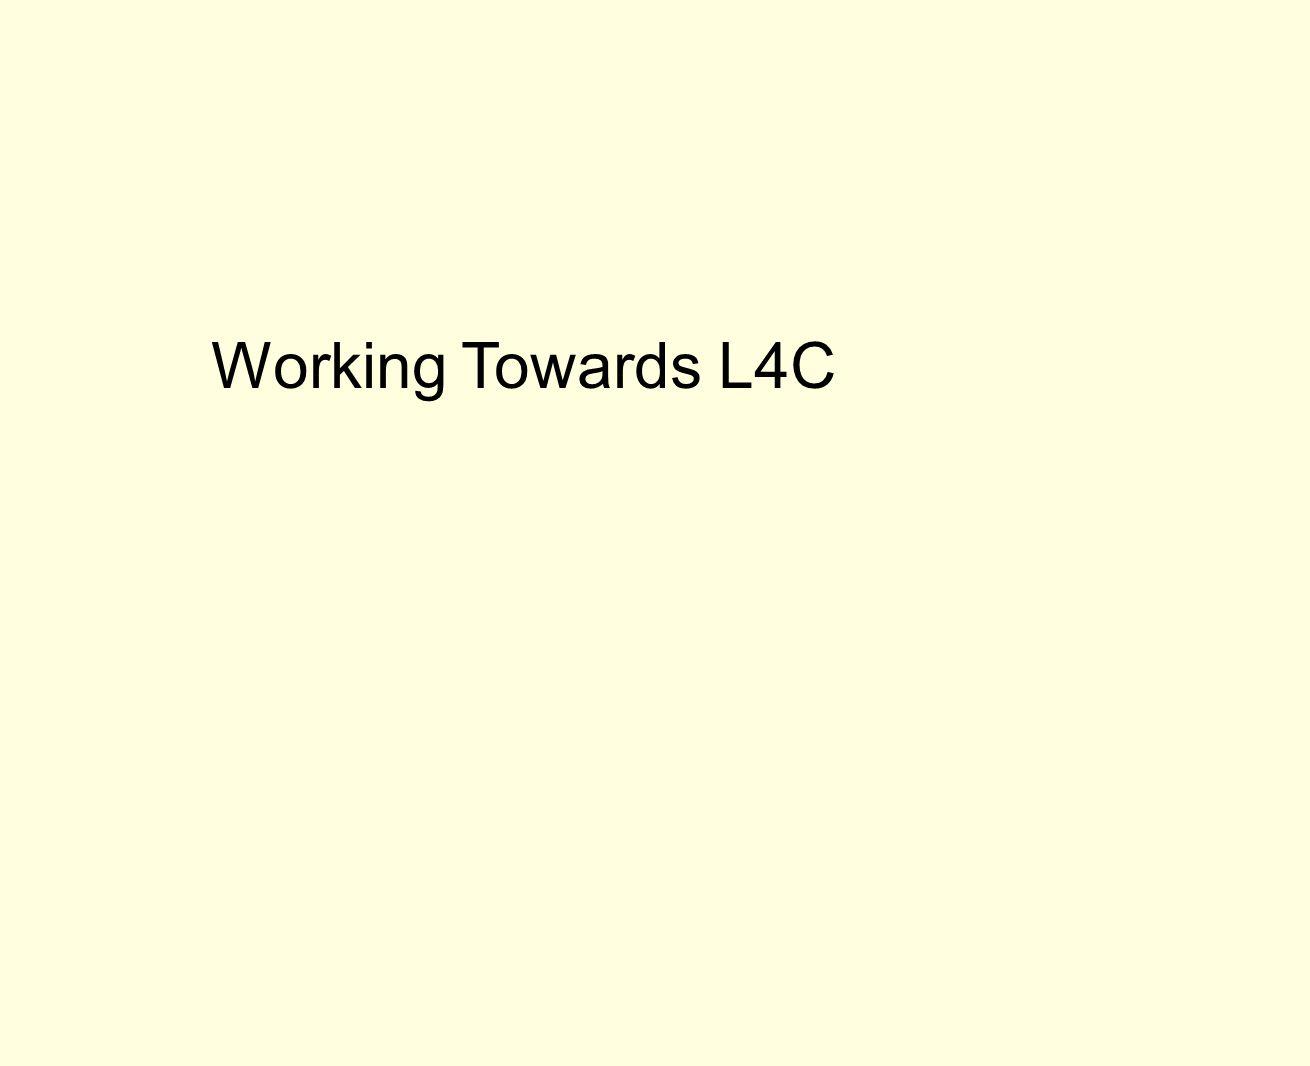 Working Towards L4C